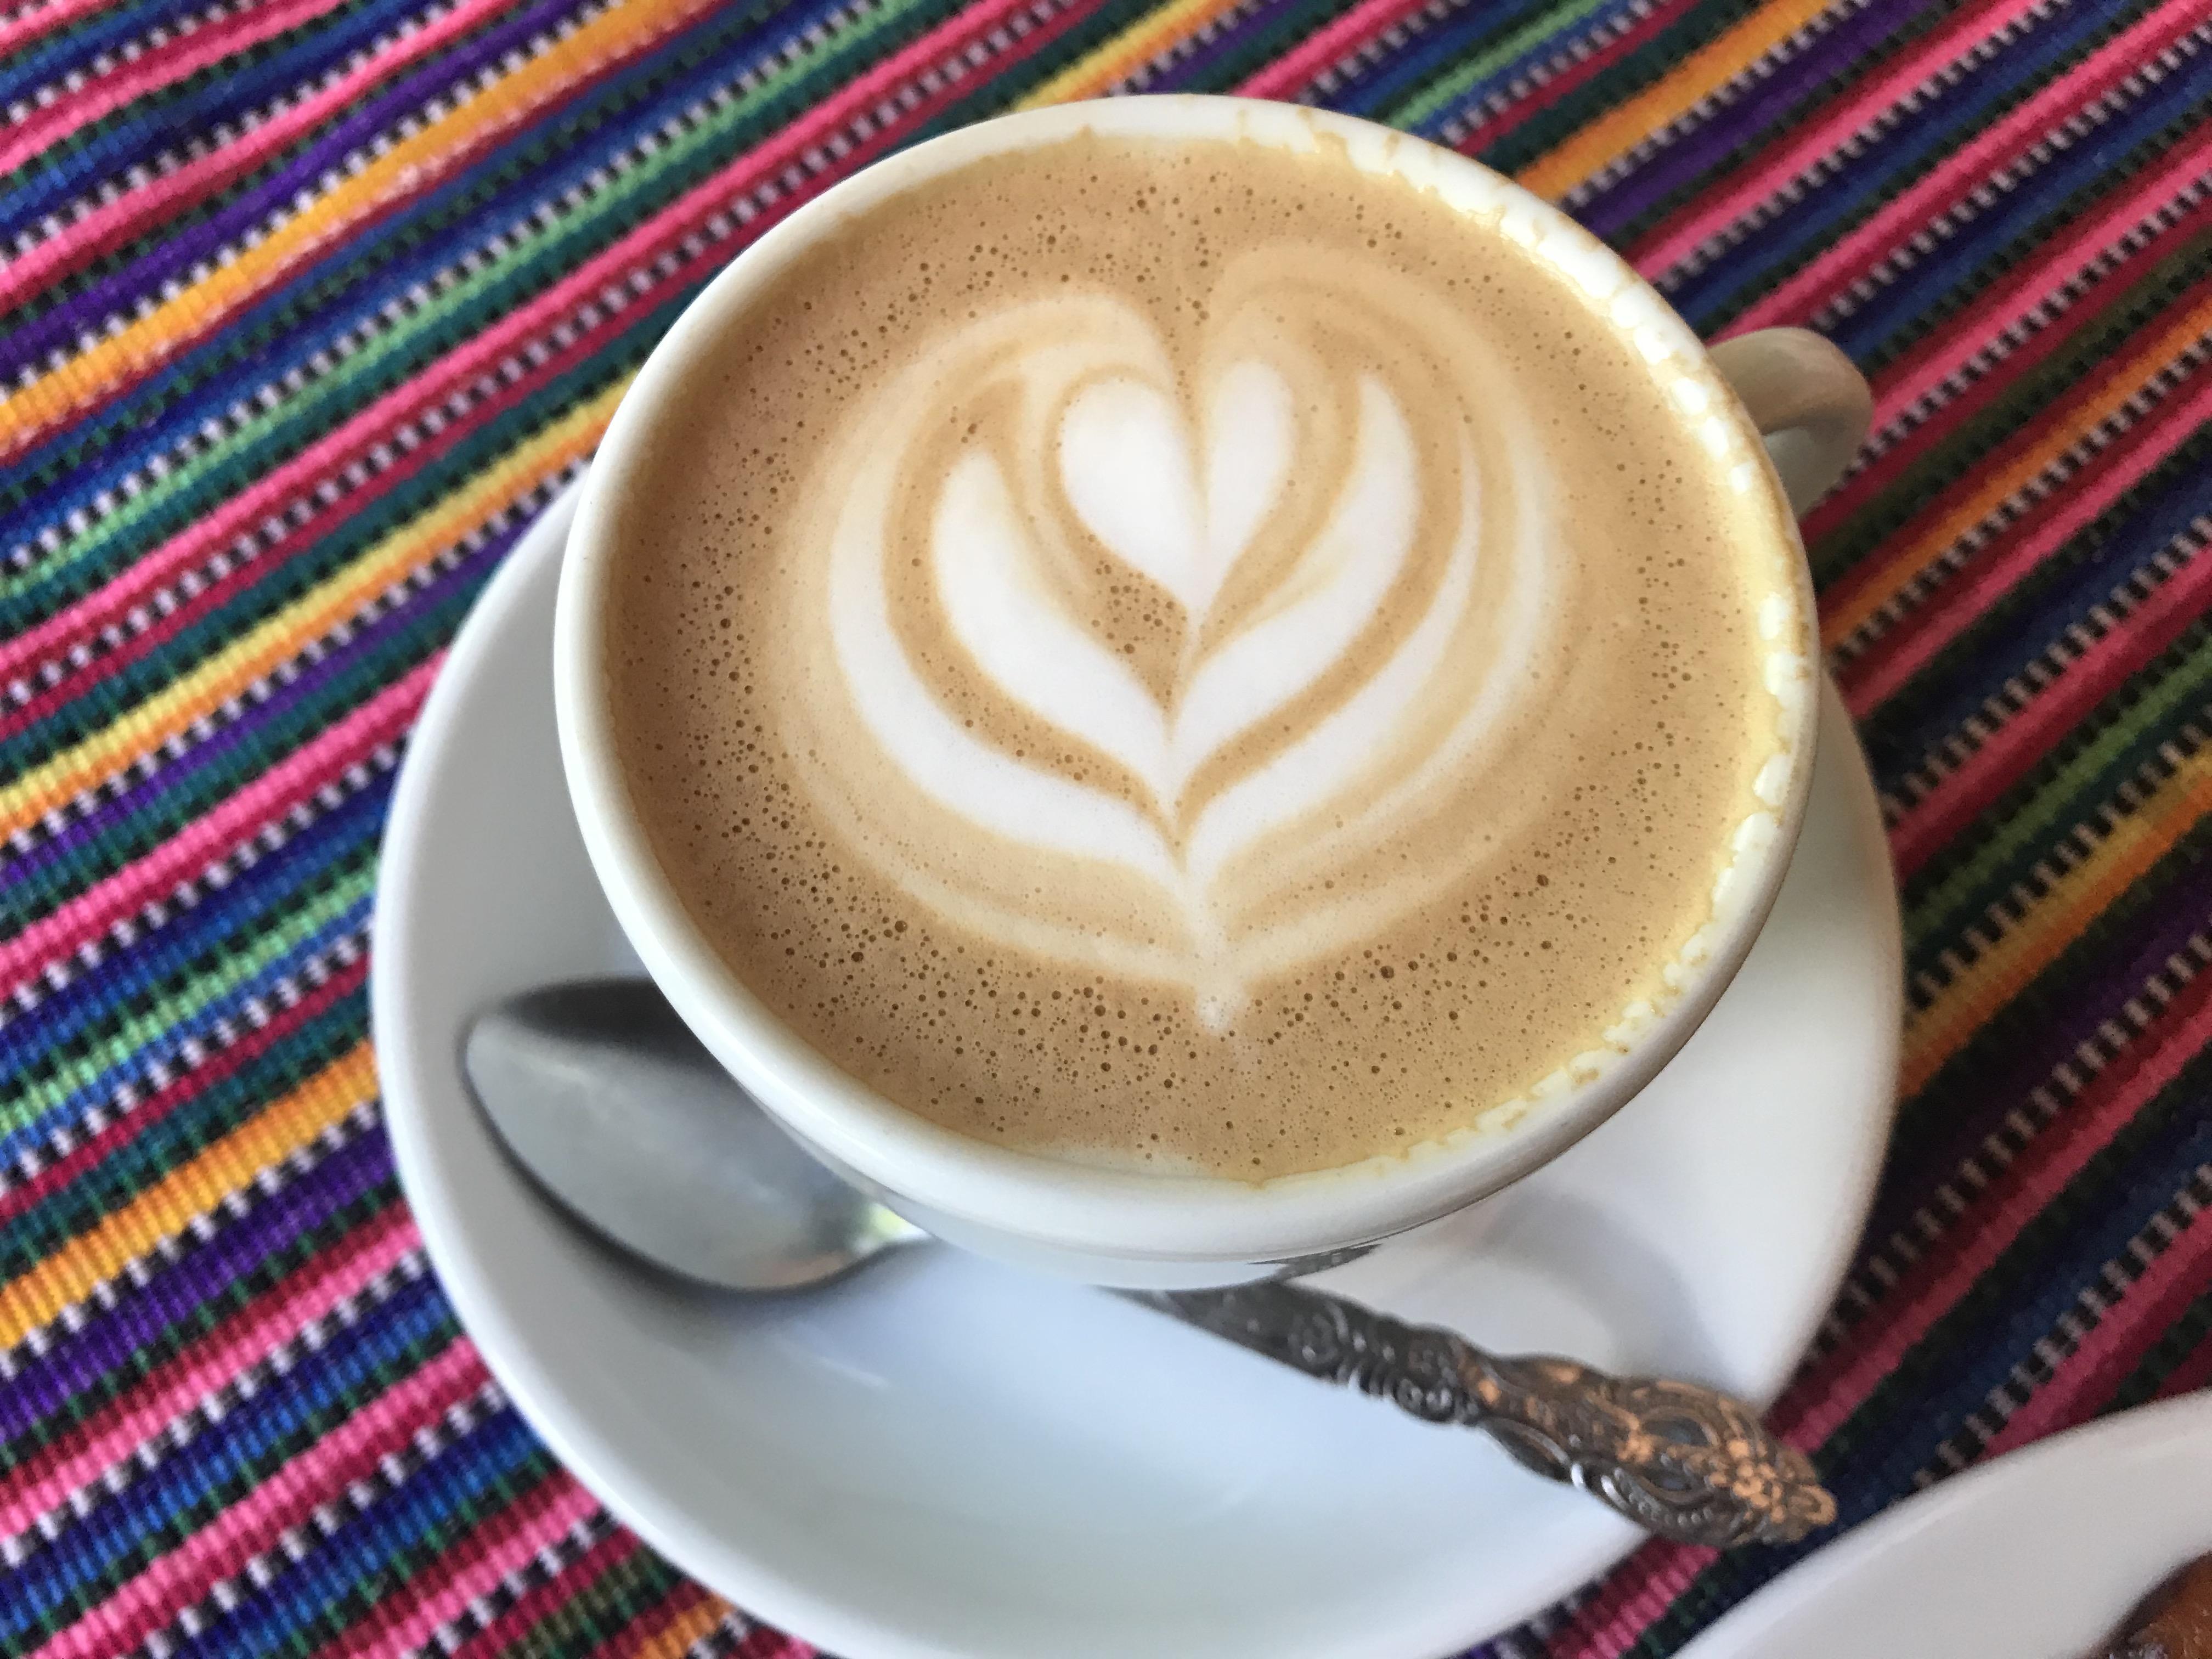 Fernando's Kaffee